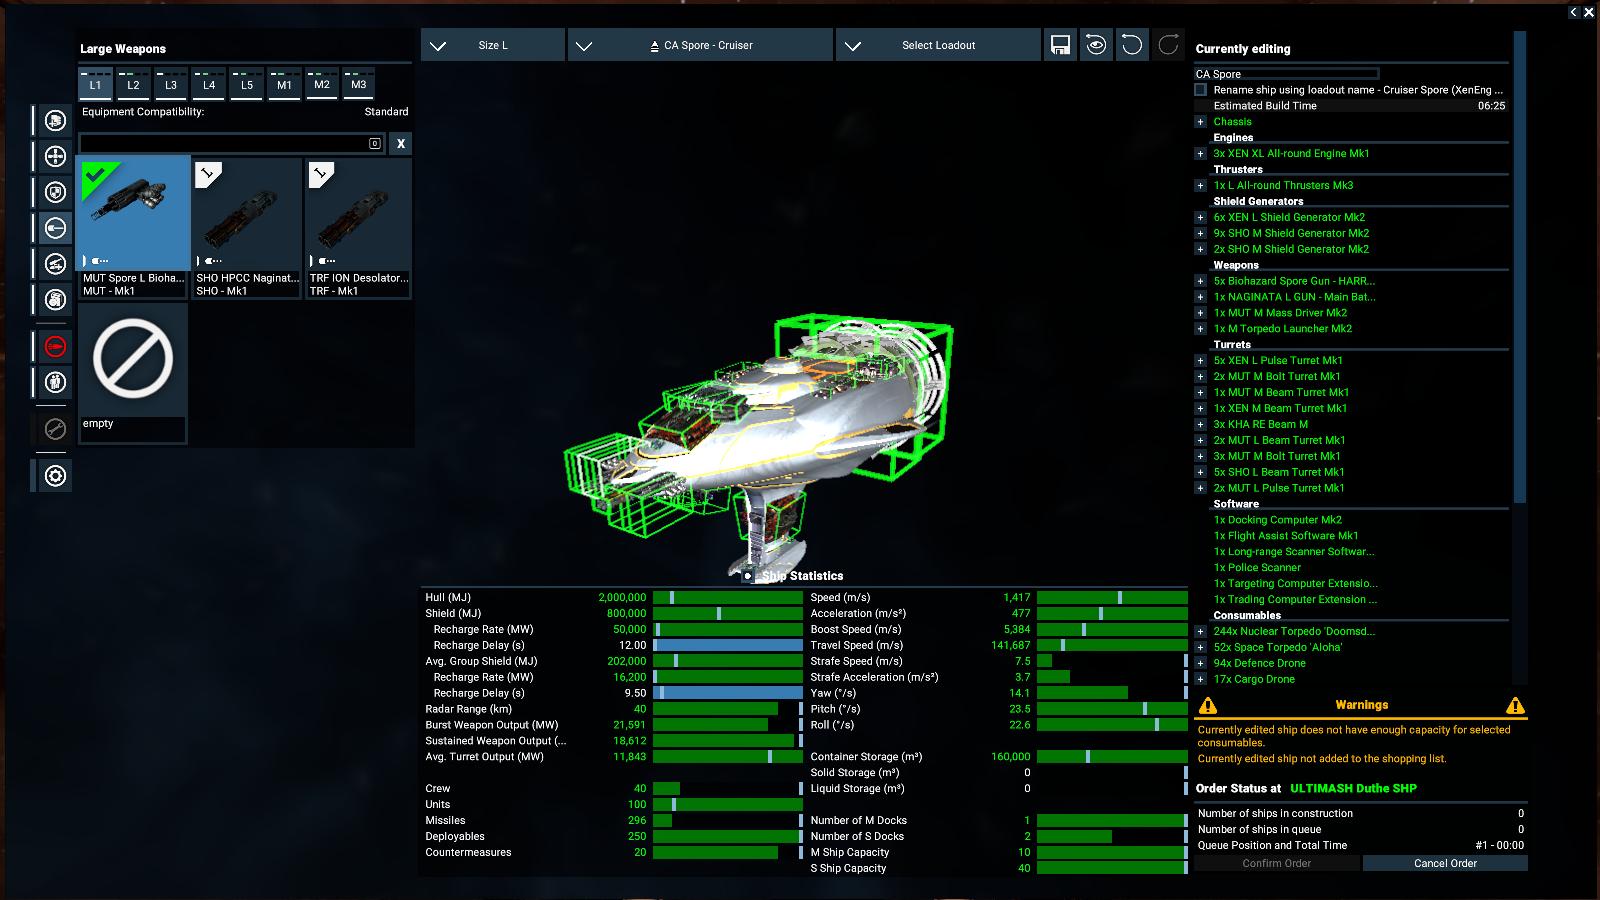 Spore-class mutant Cruiser